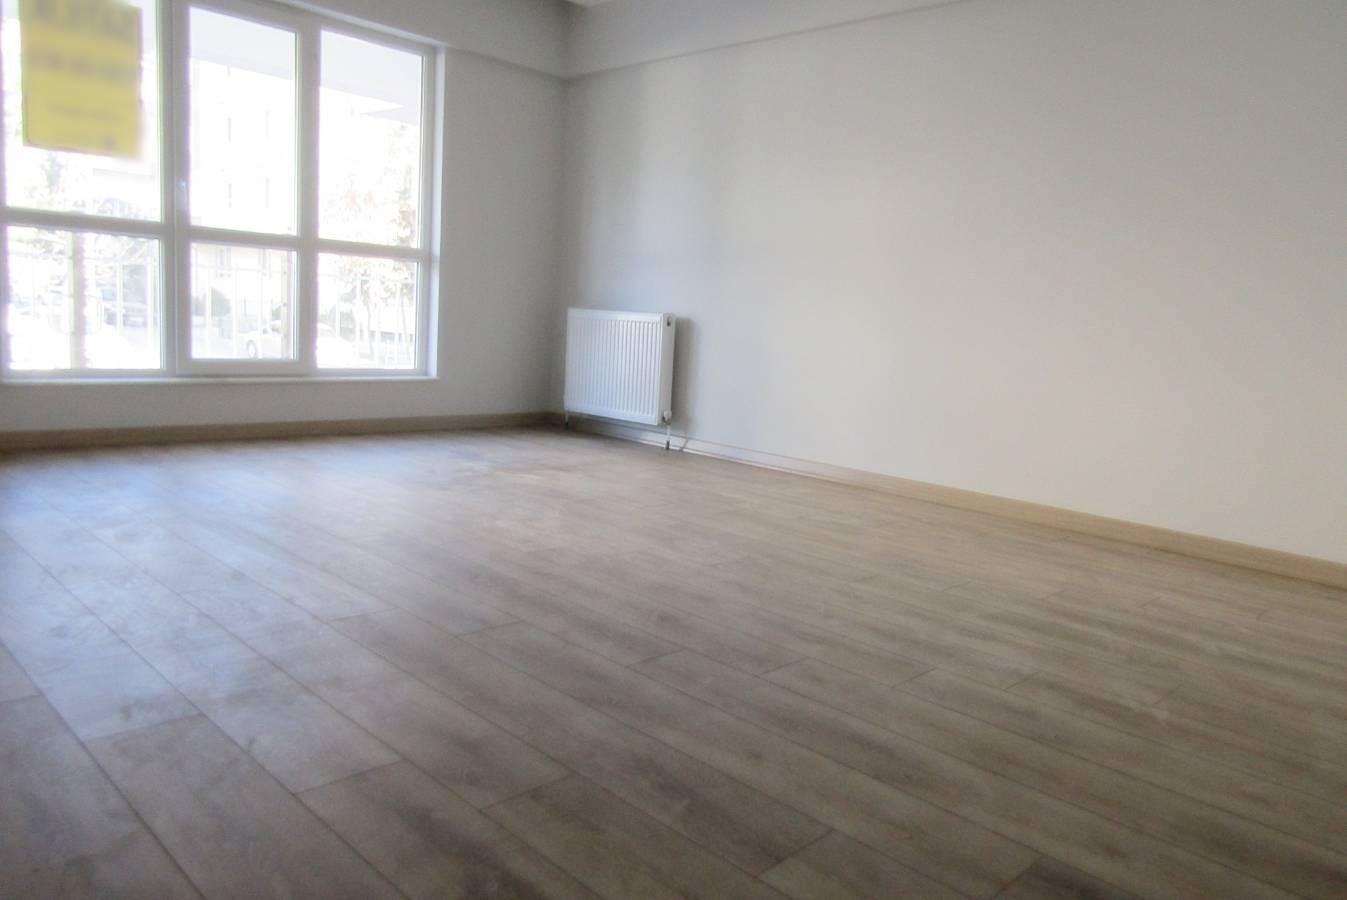 SR EMLAK'TAN İSTASYON MAH 'DE 2+1 110 m² ARA KATTA ÖN CEPHE ASANSÖRLÜ SIFIR DAİRE